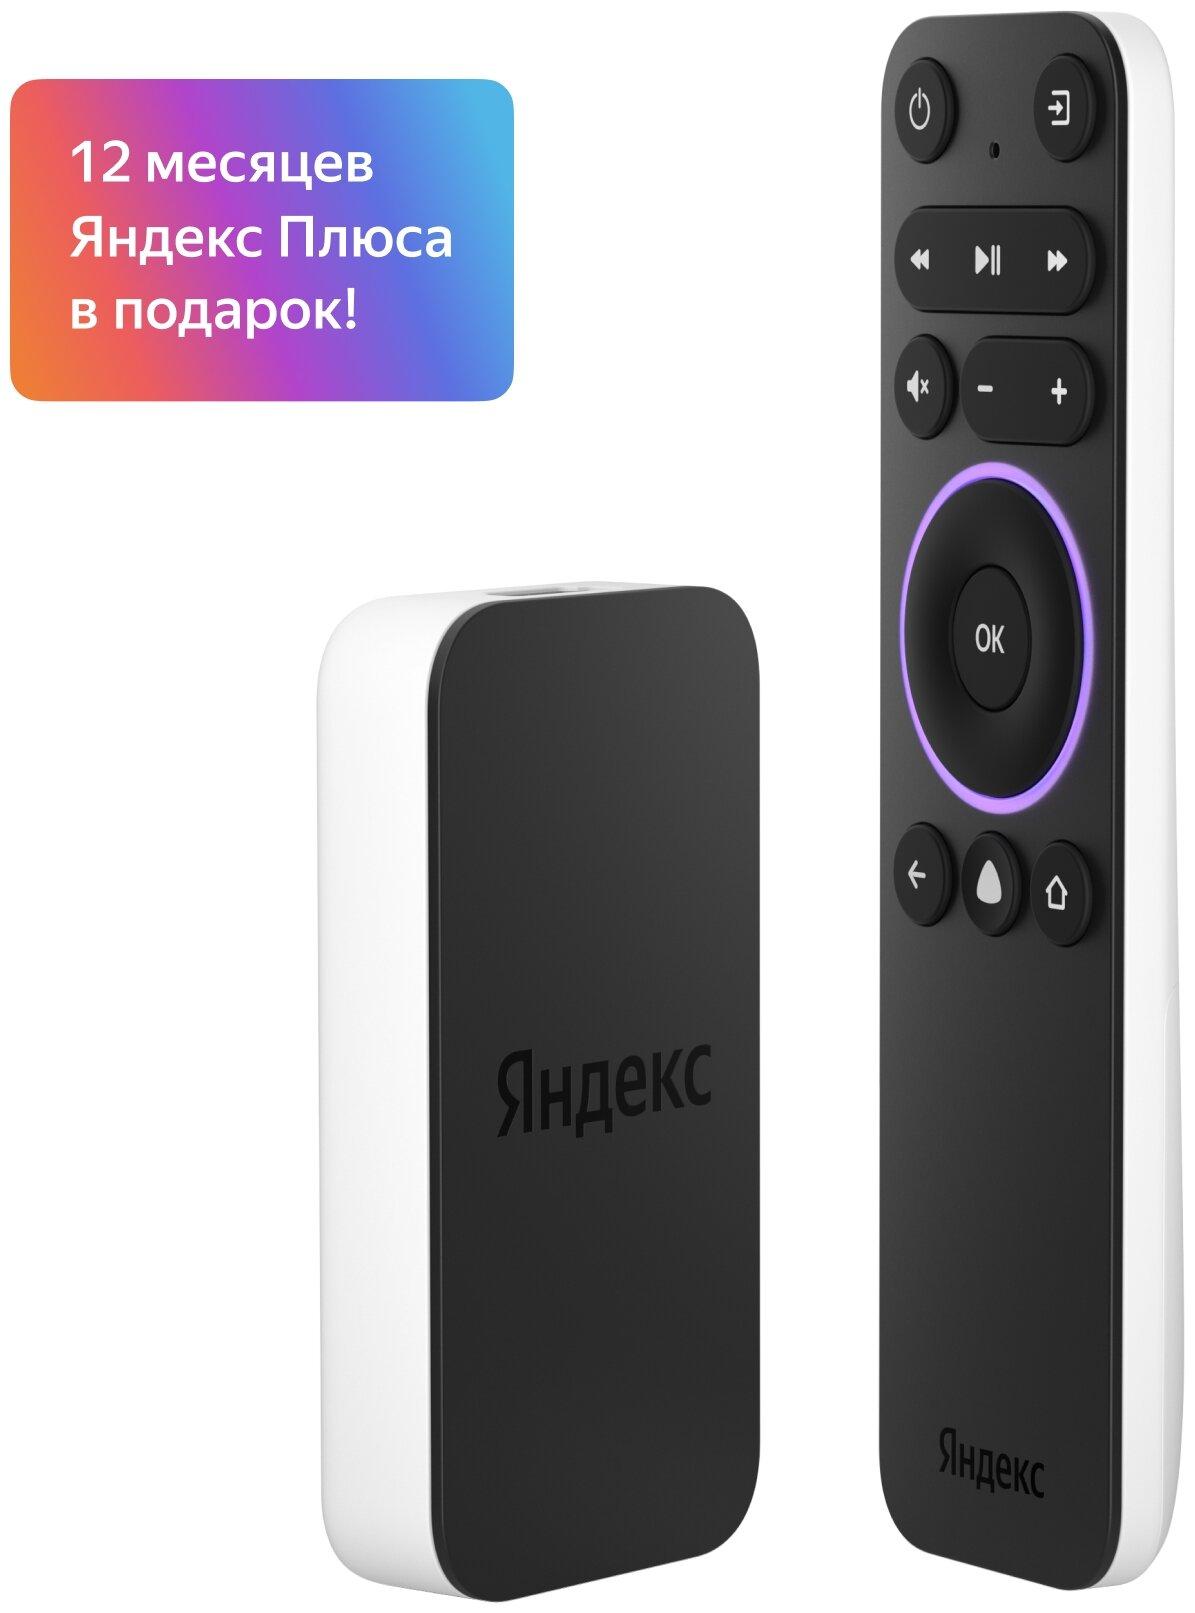 Модуль с Яндекс.ТВ - Смарт.ТВ с Алисой [4K] — цены на Яндекс.Маркете